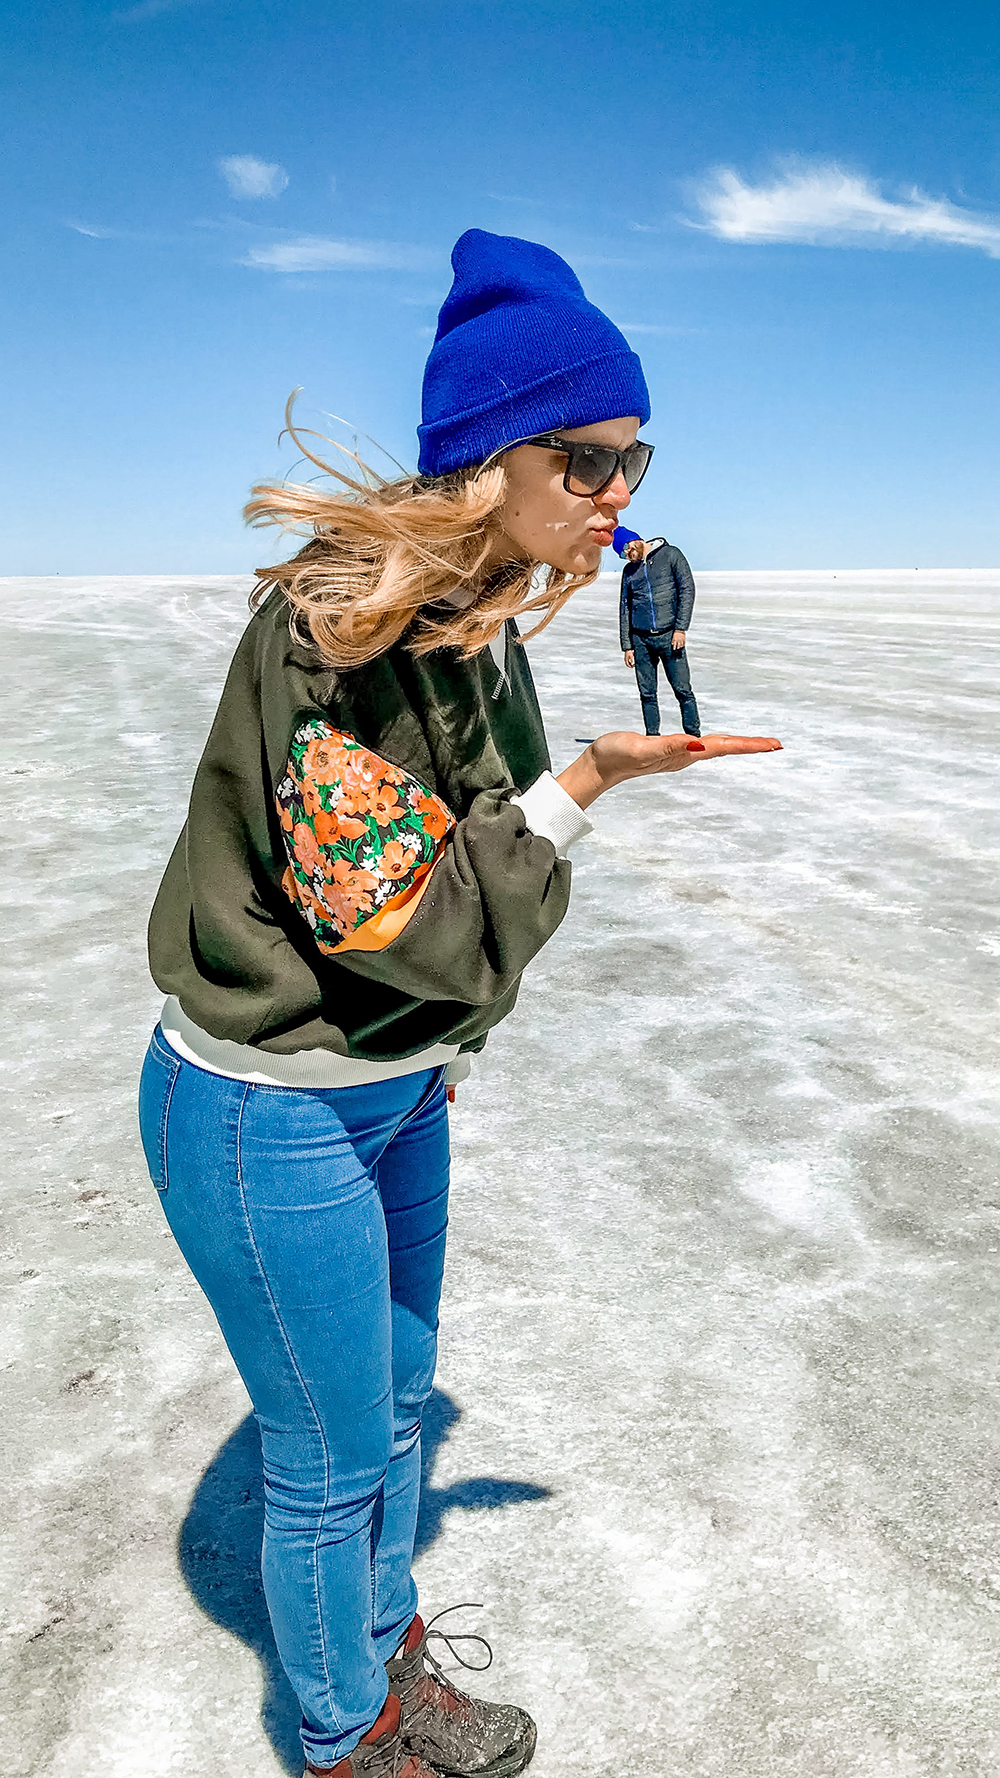 Salar de Uyuni photoshoot - How to pick the best Uyuni Salt Flats tour to Bolivia? | Aliz's Wonderland